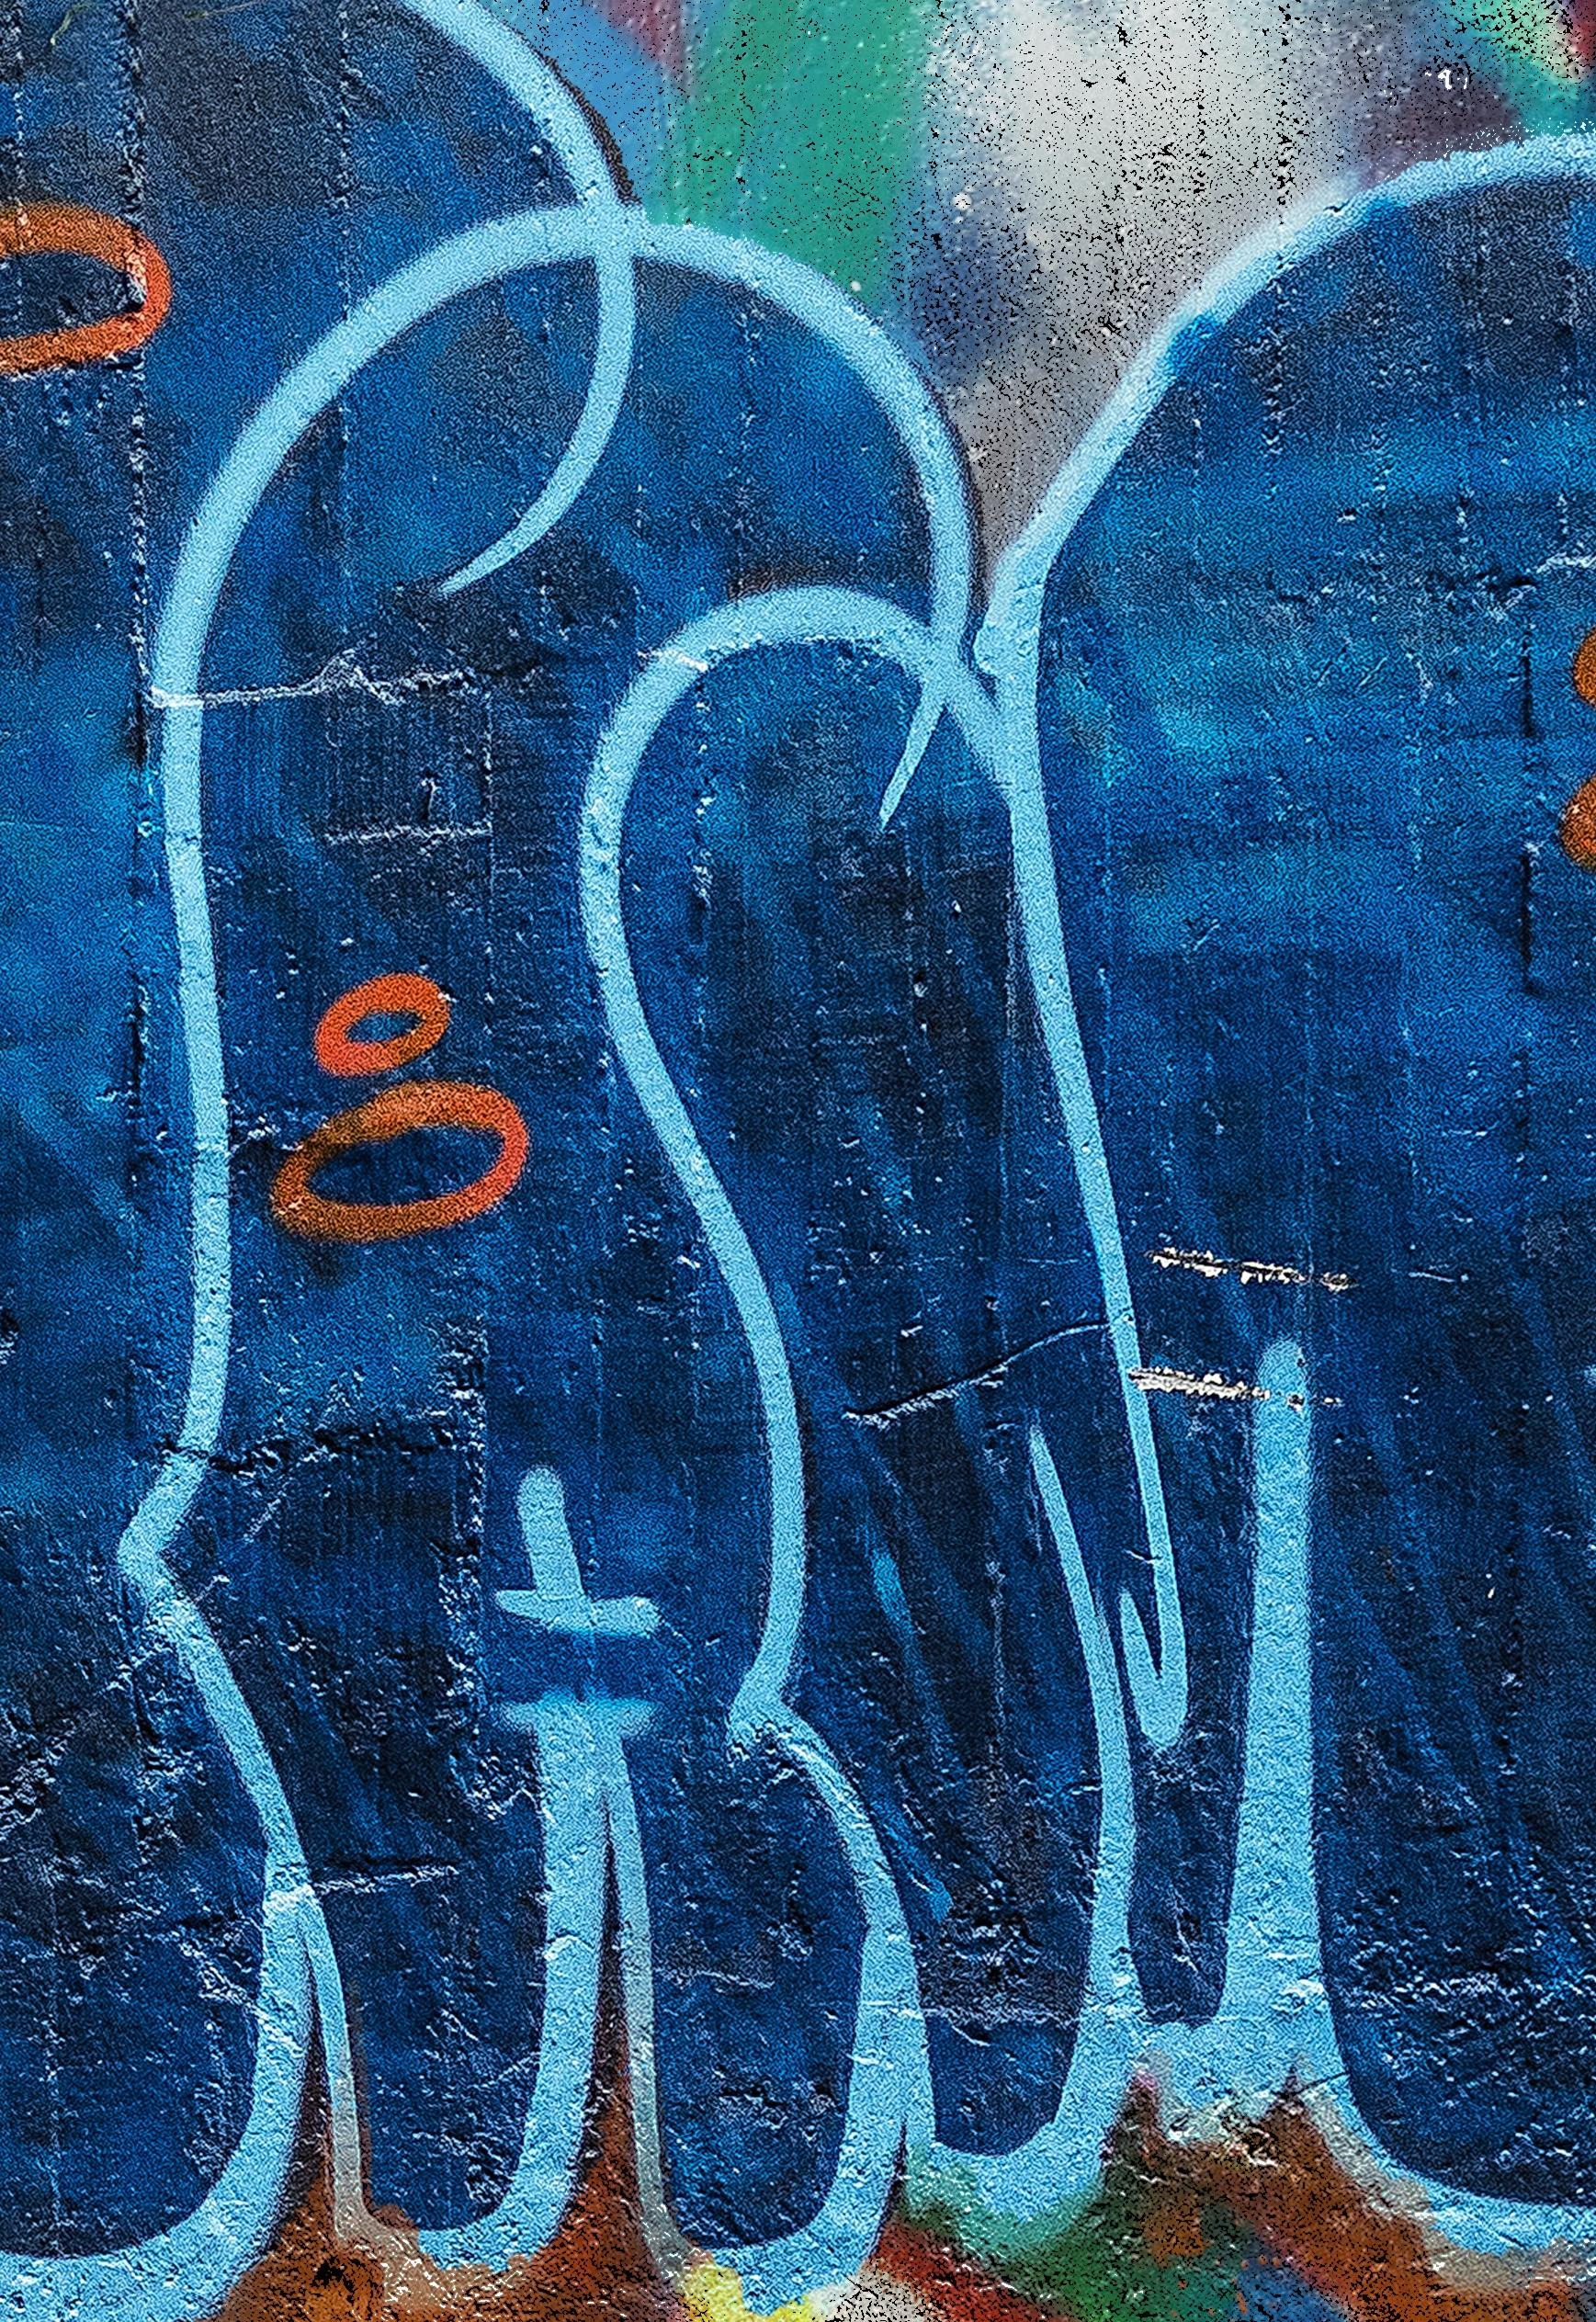 image libre  graffiti  abstrait  urbain  mur  art  culture